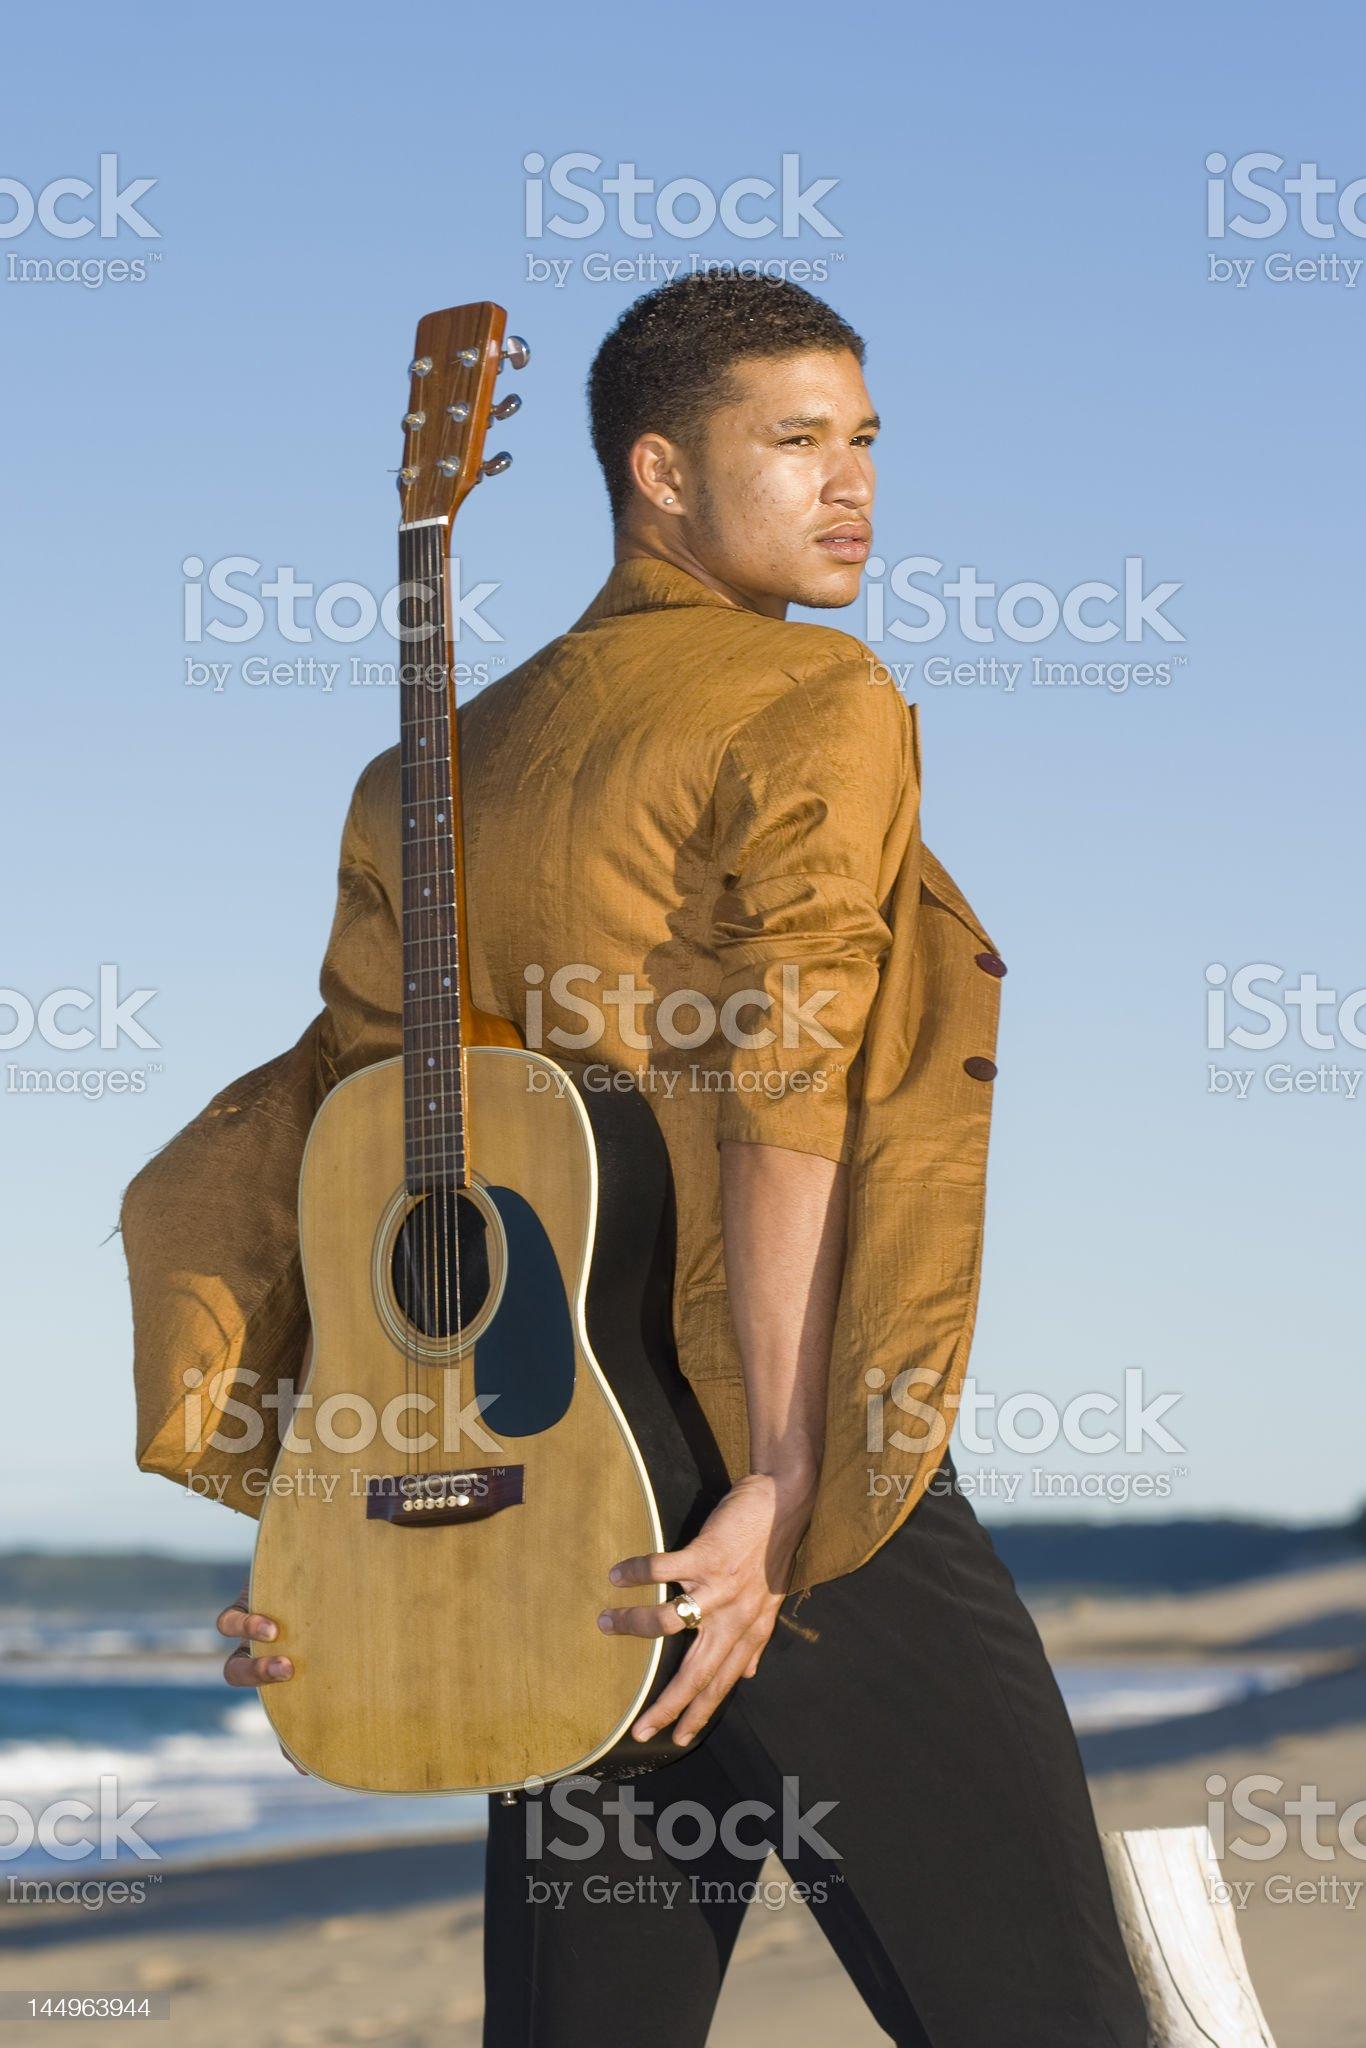 Beach Guitarist royalty-free stock photo